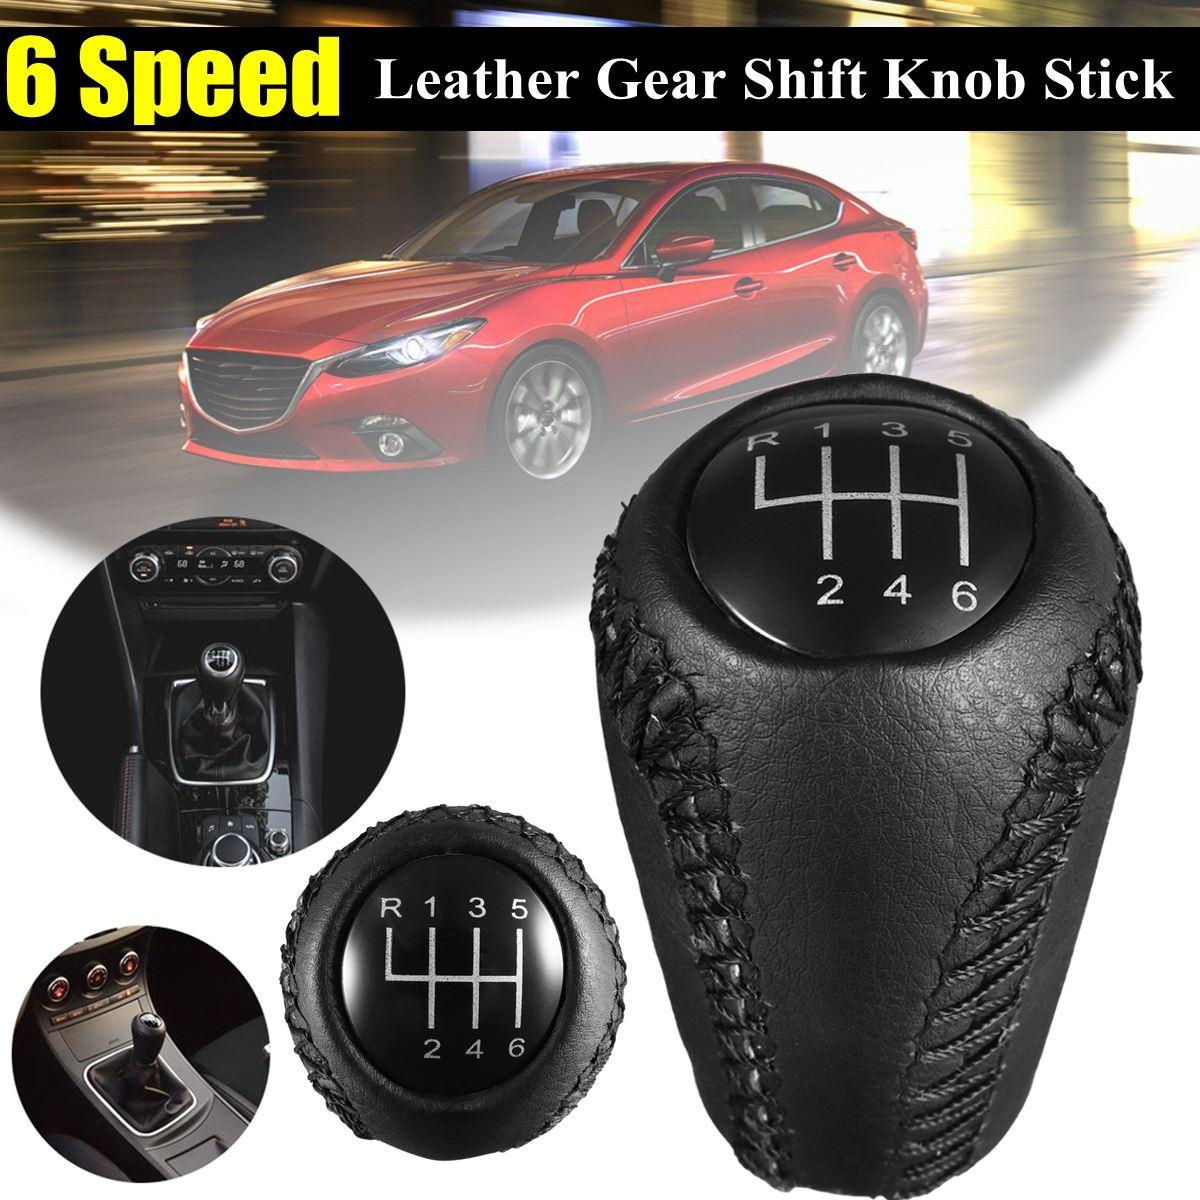 6 vitesse En Cuir Gear levier bouton Shift Pour Mazda 3 BK BL 5 CR CW 6 II GH CX-7 ER MX-5 NC III 2005 2006 2007 2008 2009 2010 2011